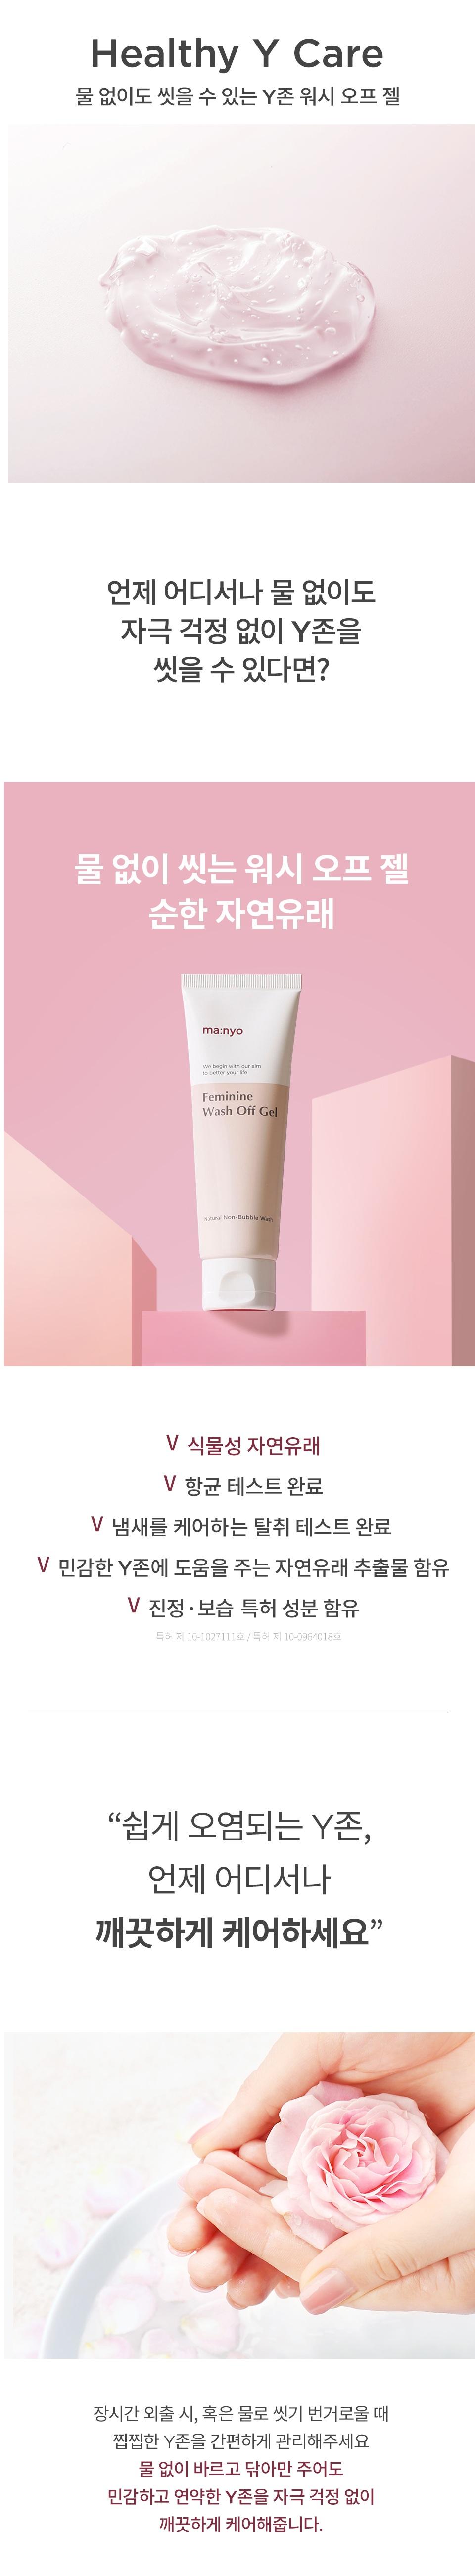 Manyo Factory Feminine Wash Off Gel 80ml korean skincare product online shop malaysia Macau1